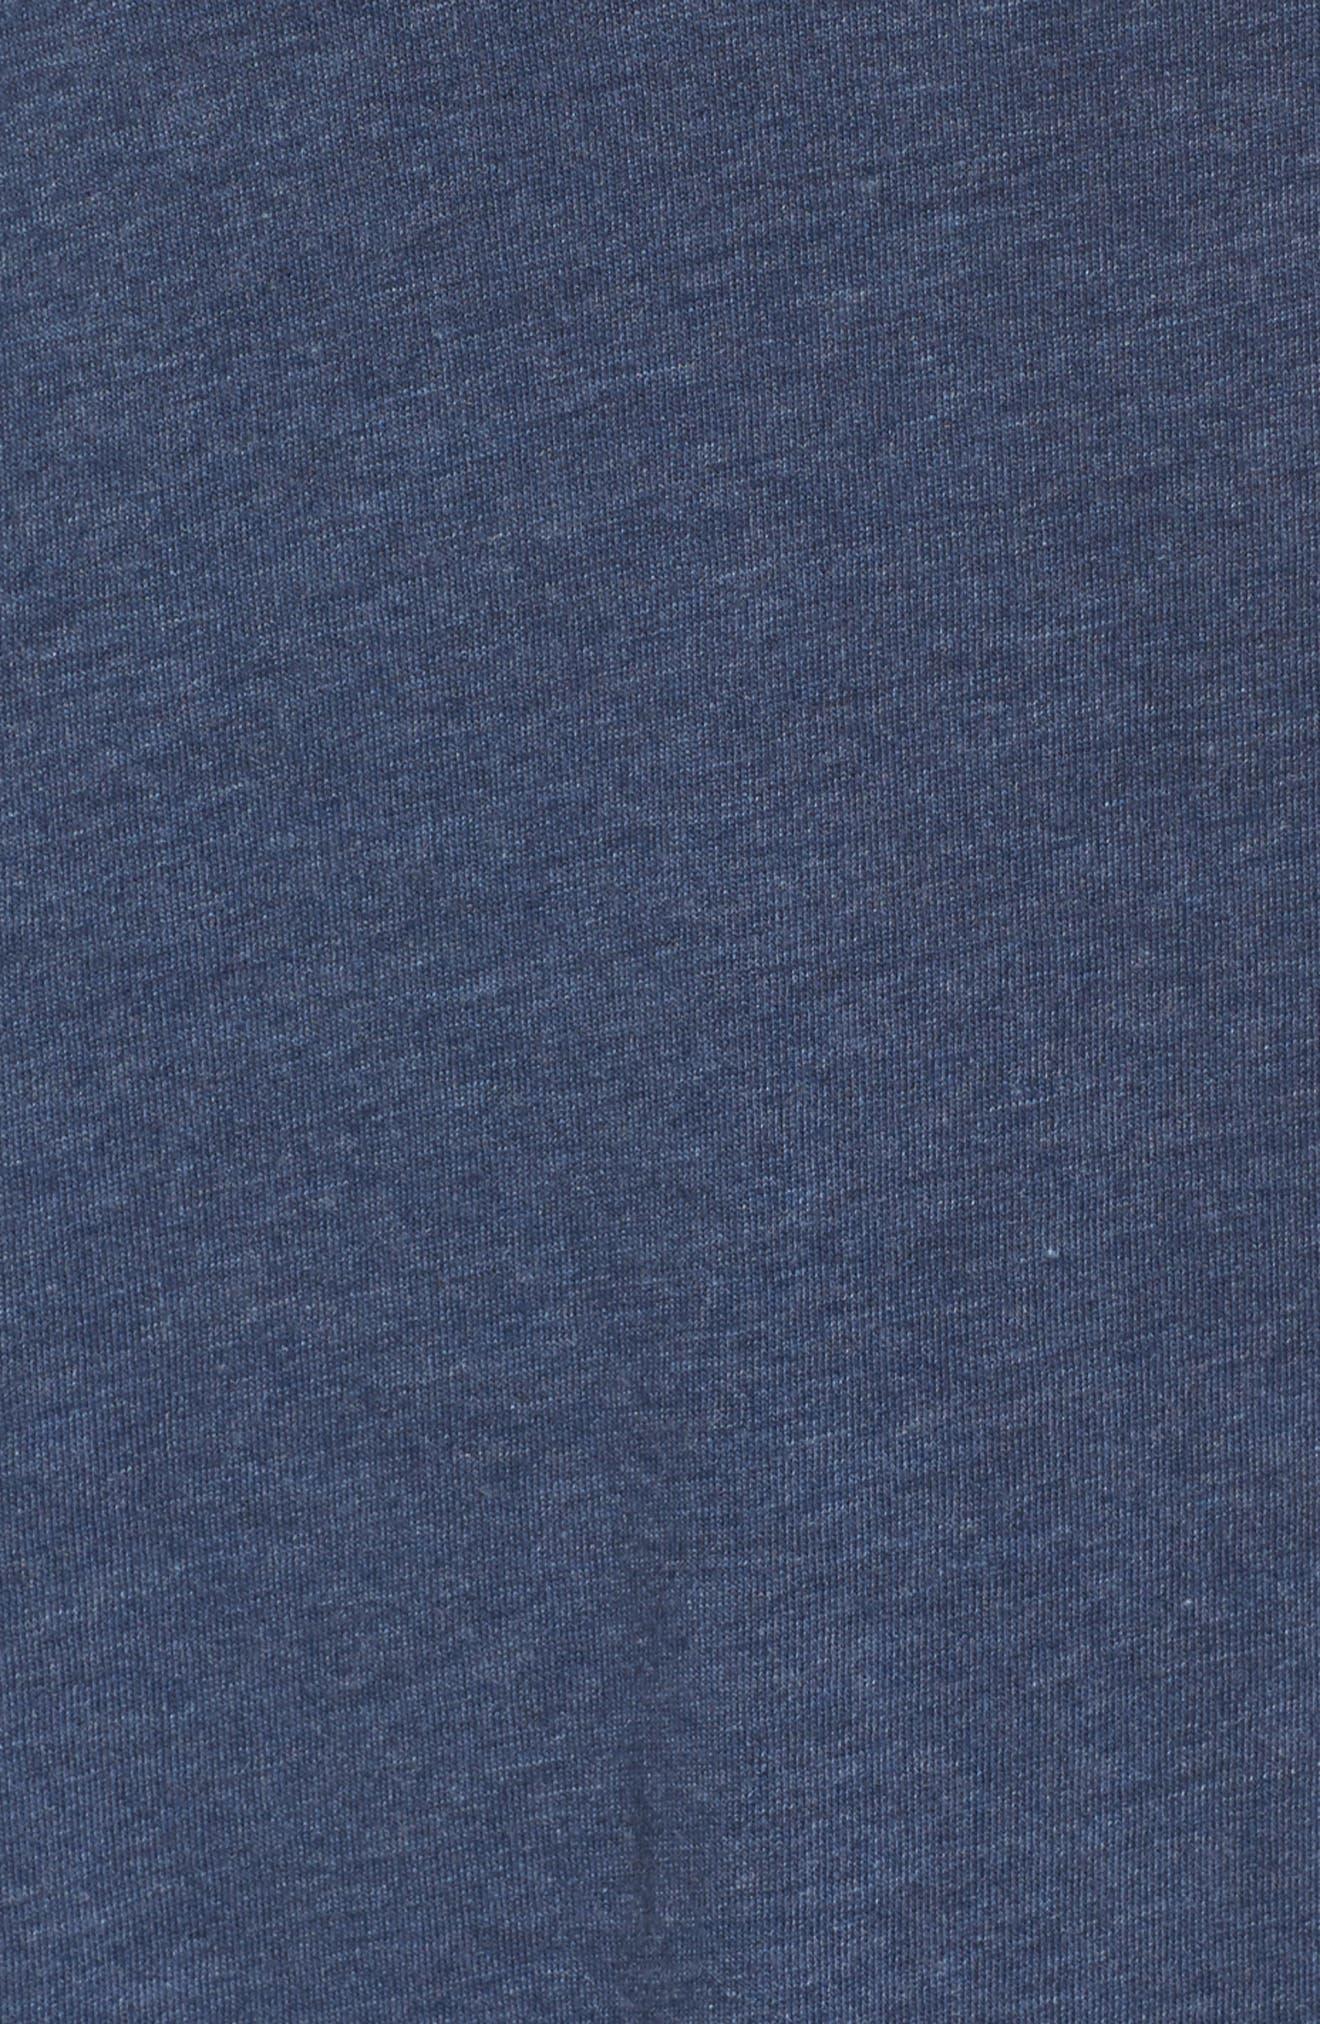 Jersey Chemise,                             Alternate thumbnail 5, color,                             Blue Melange